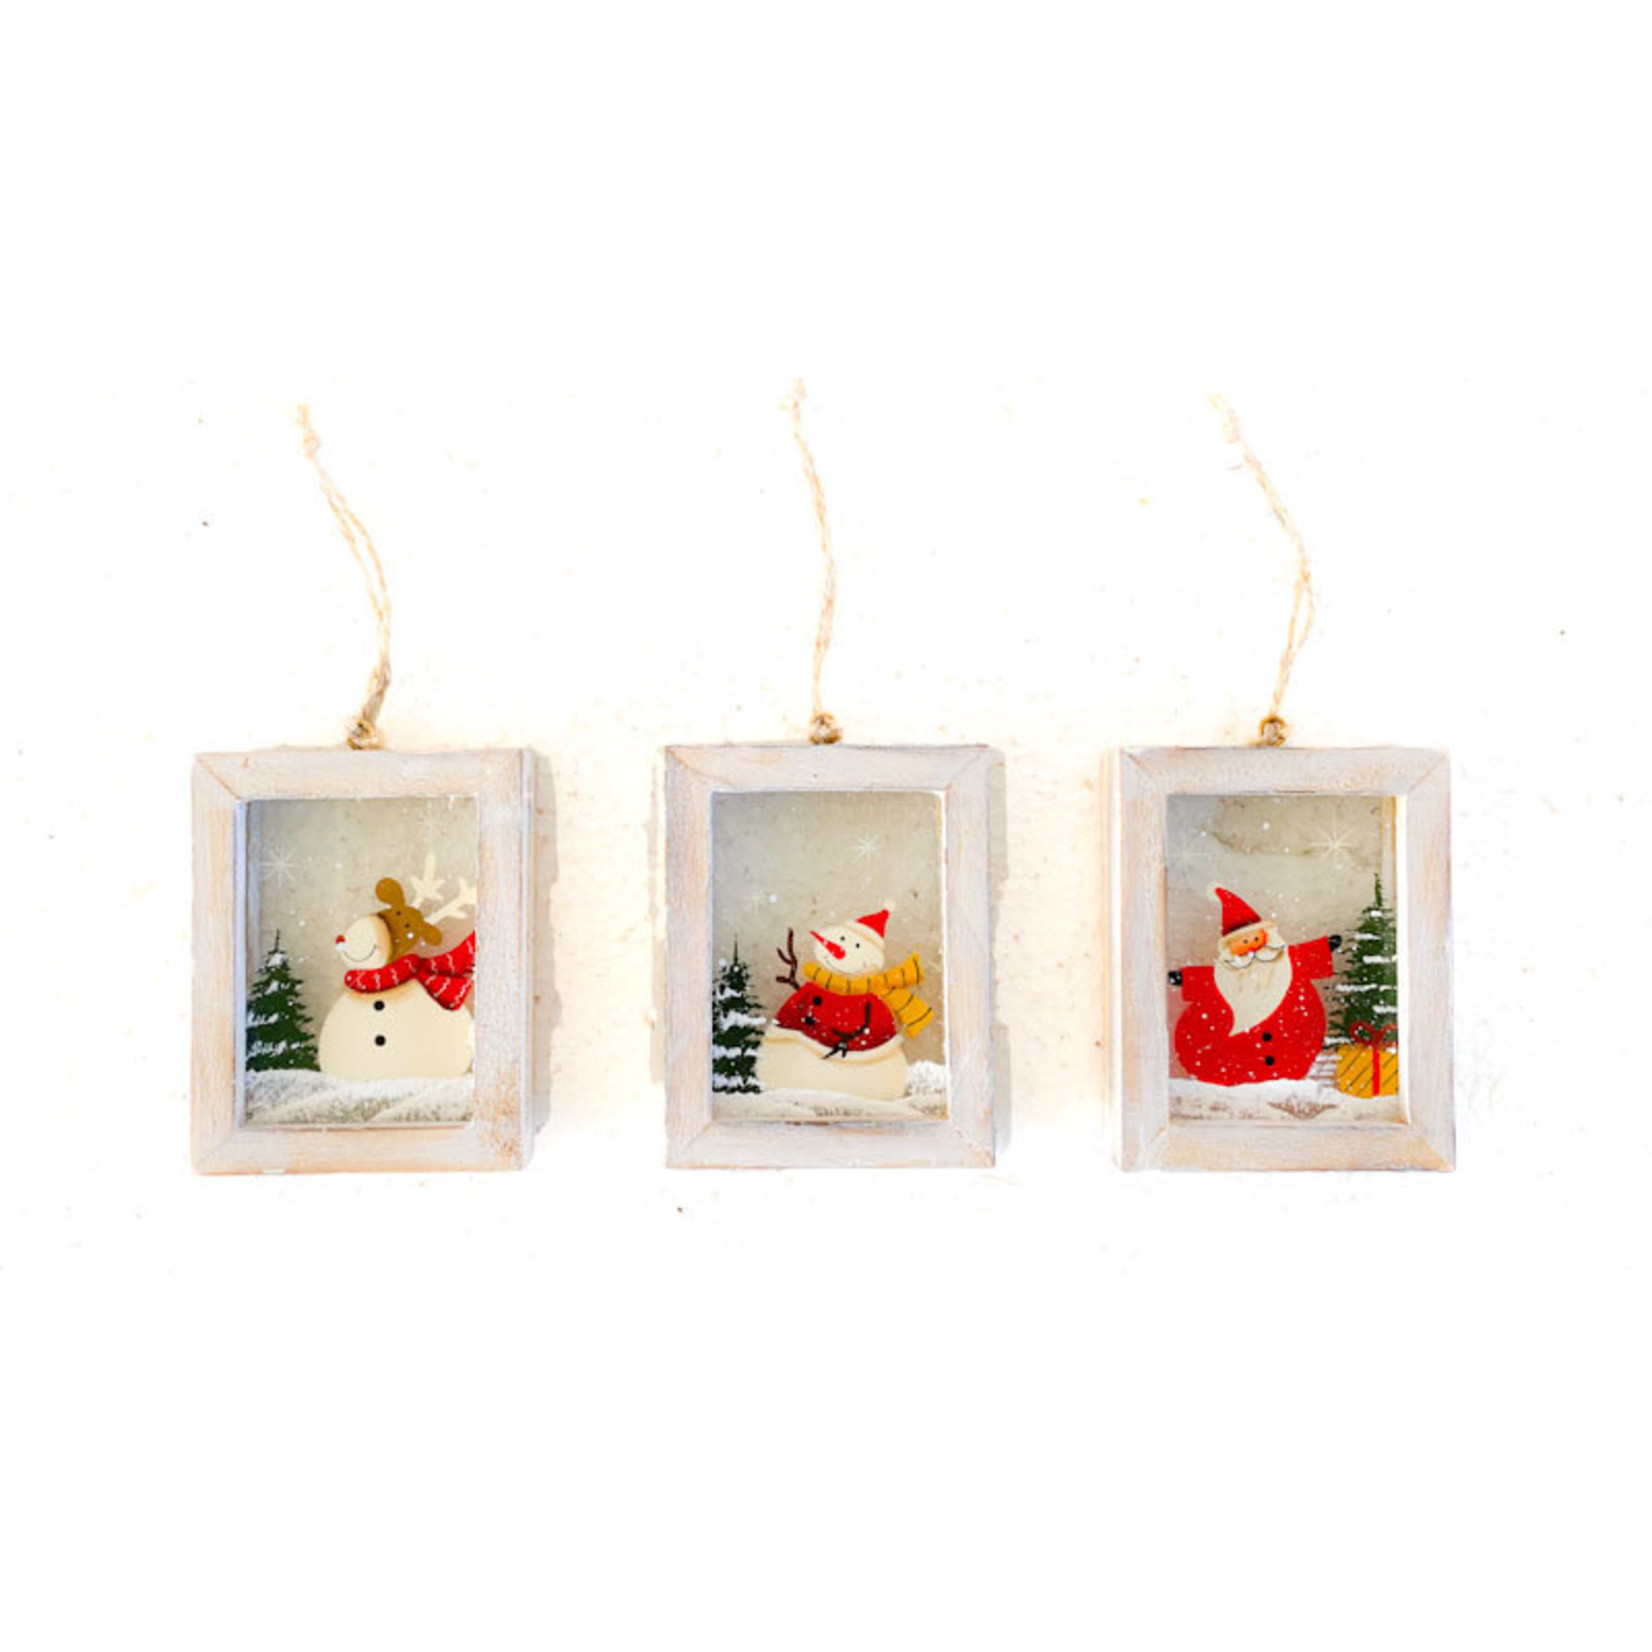 Ornament - Framed Glass w Santa or Snowman